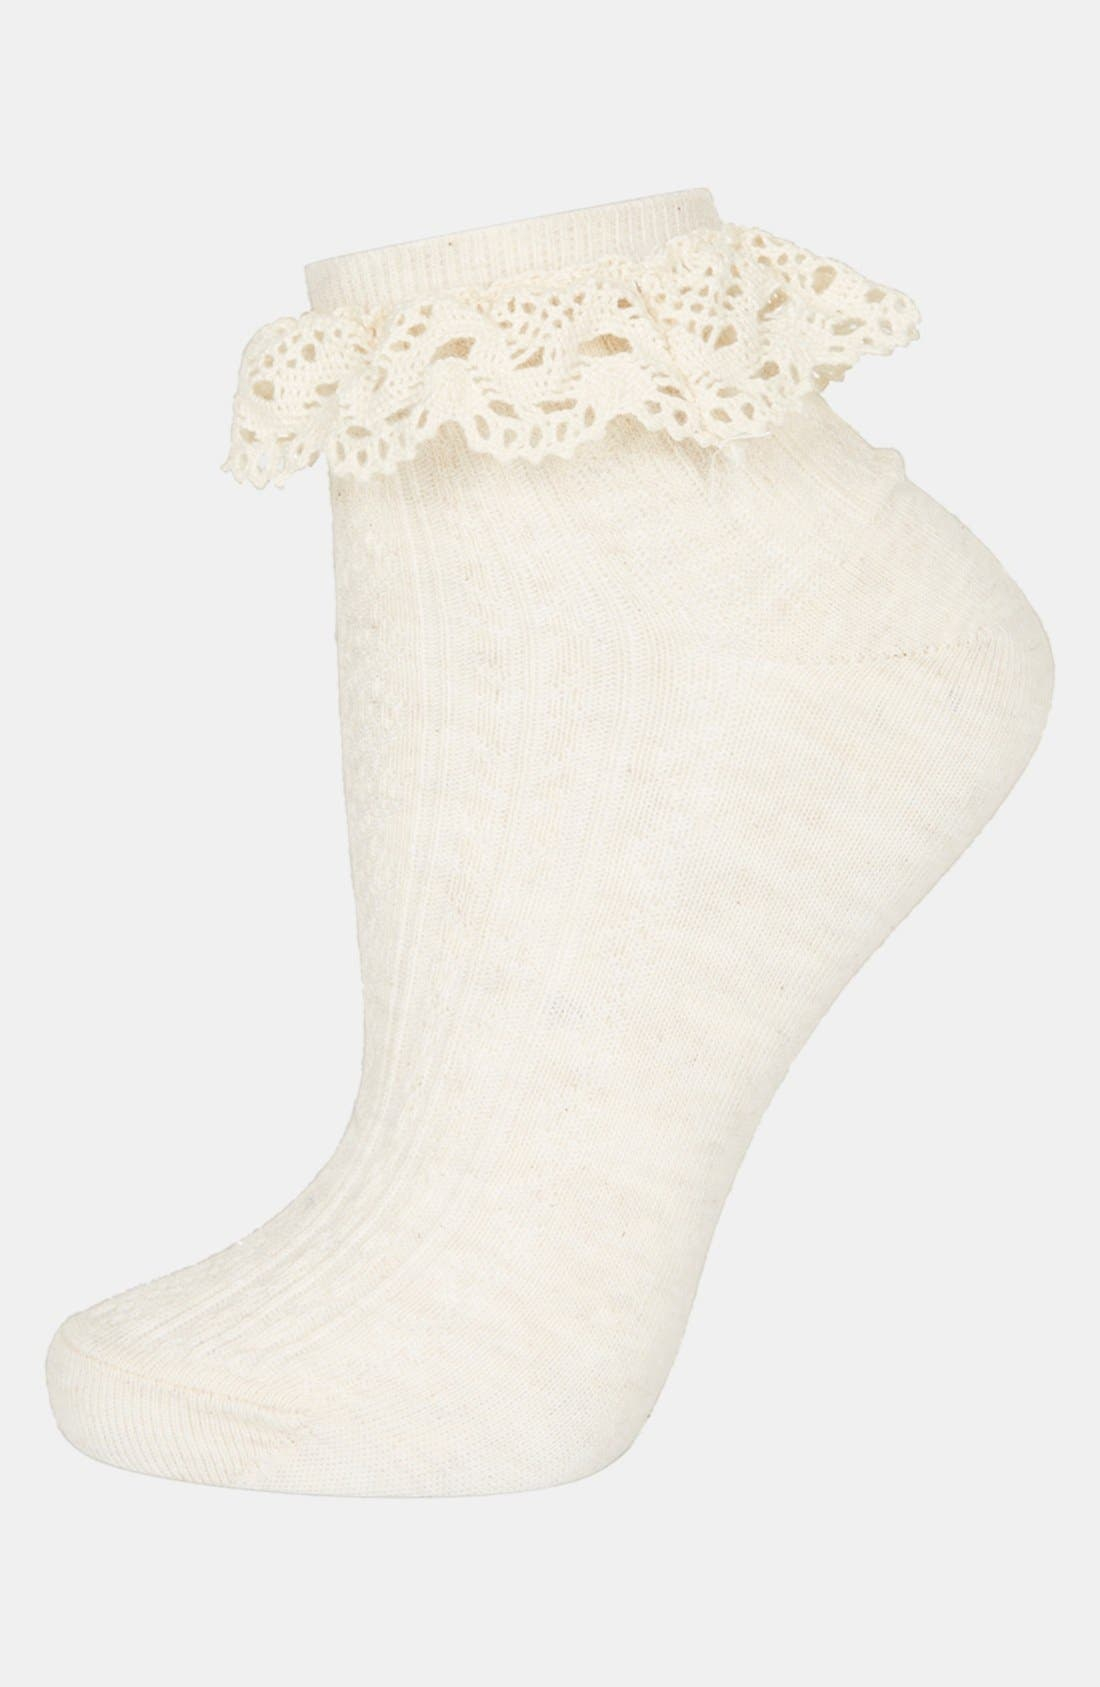 Alternate Image 1 Selected - Topshop Crocheted Trim Ankle Socks